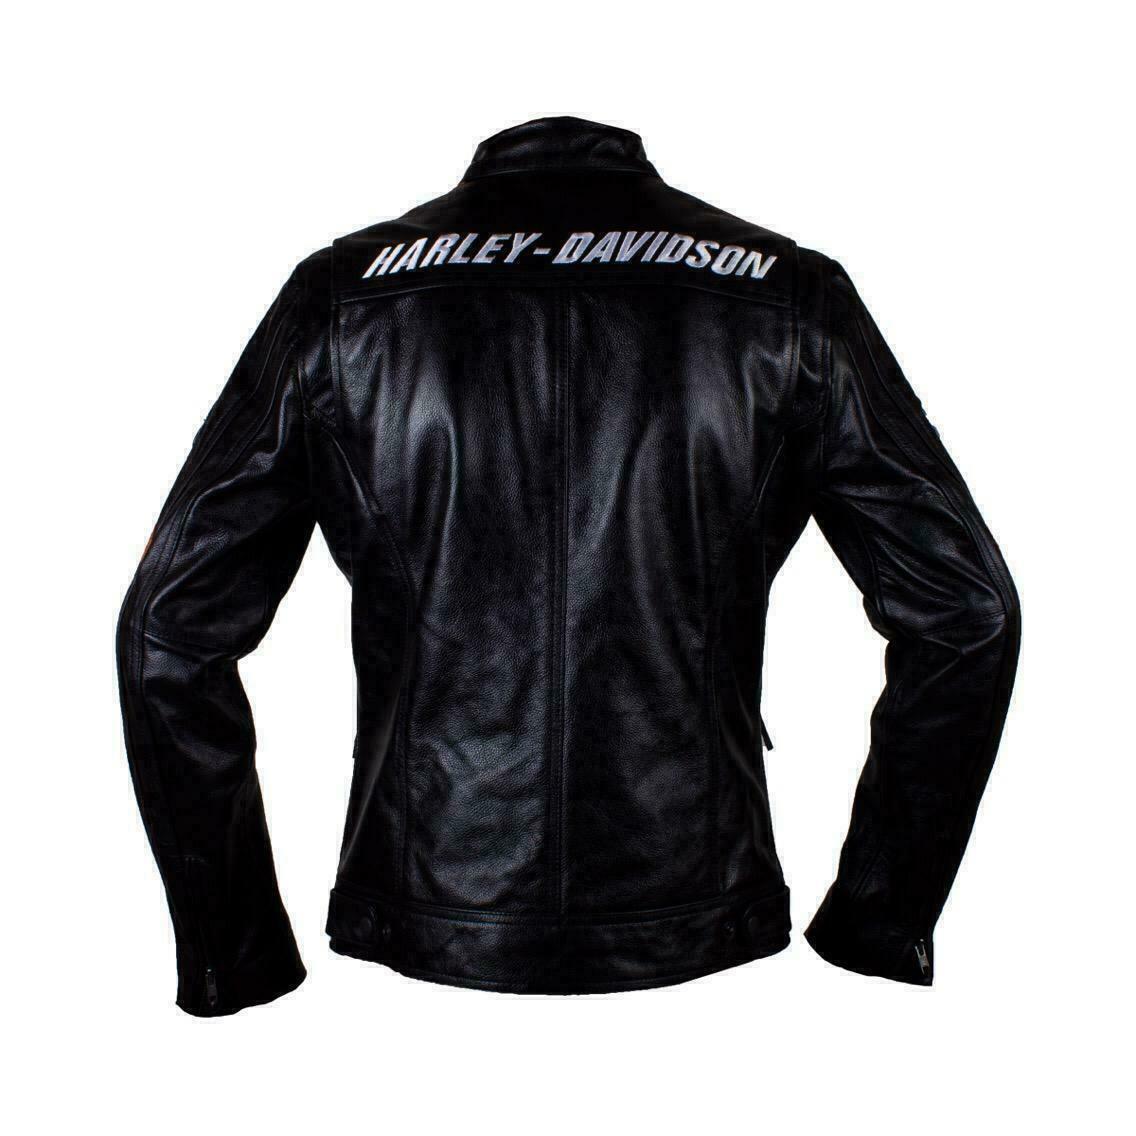 Blu Apparel ® In Finta Pelle Giacca Da Motociclista Da Uomo Slim Fit Nero Vera UK STOCK